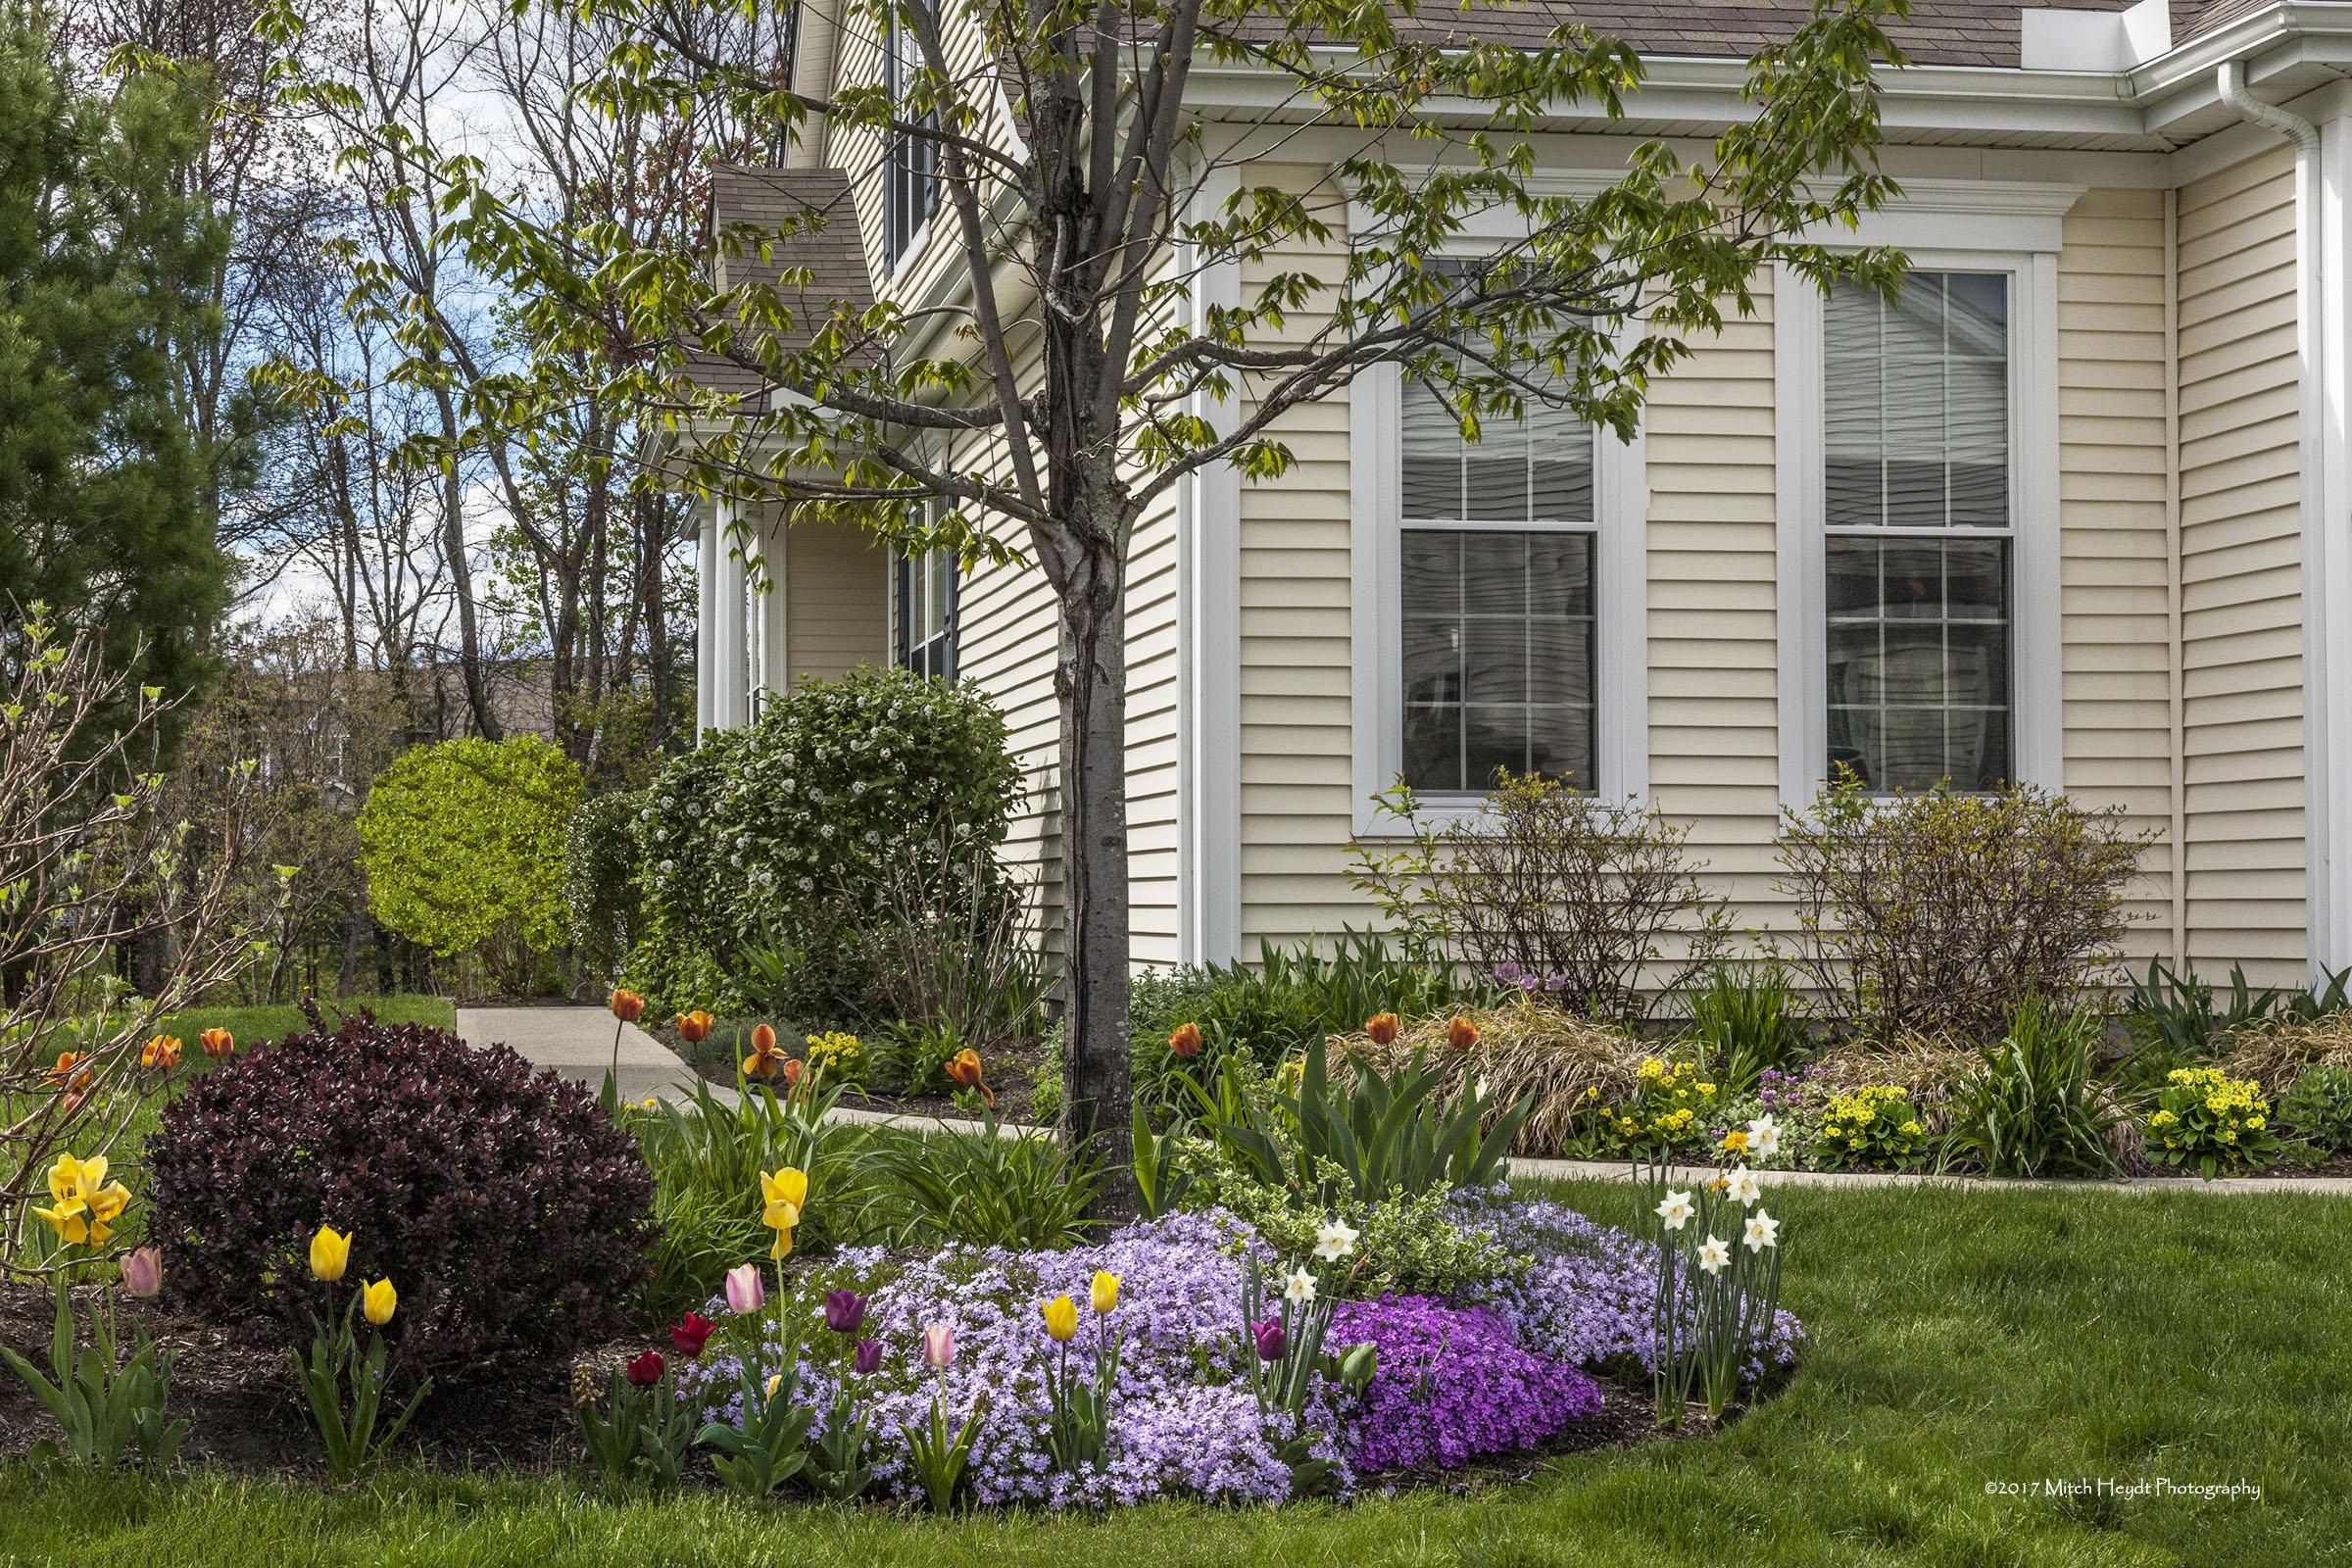 Arbor Glen Condo in Bloom